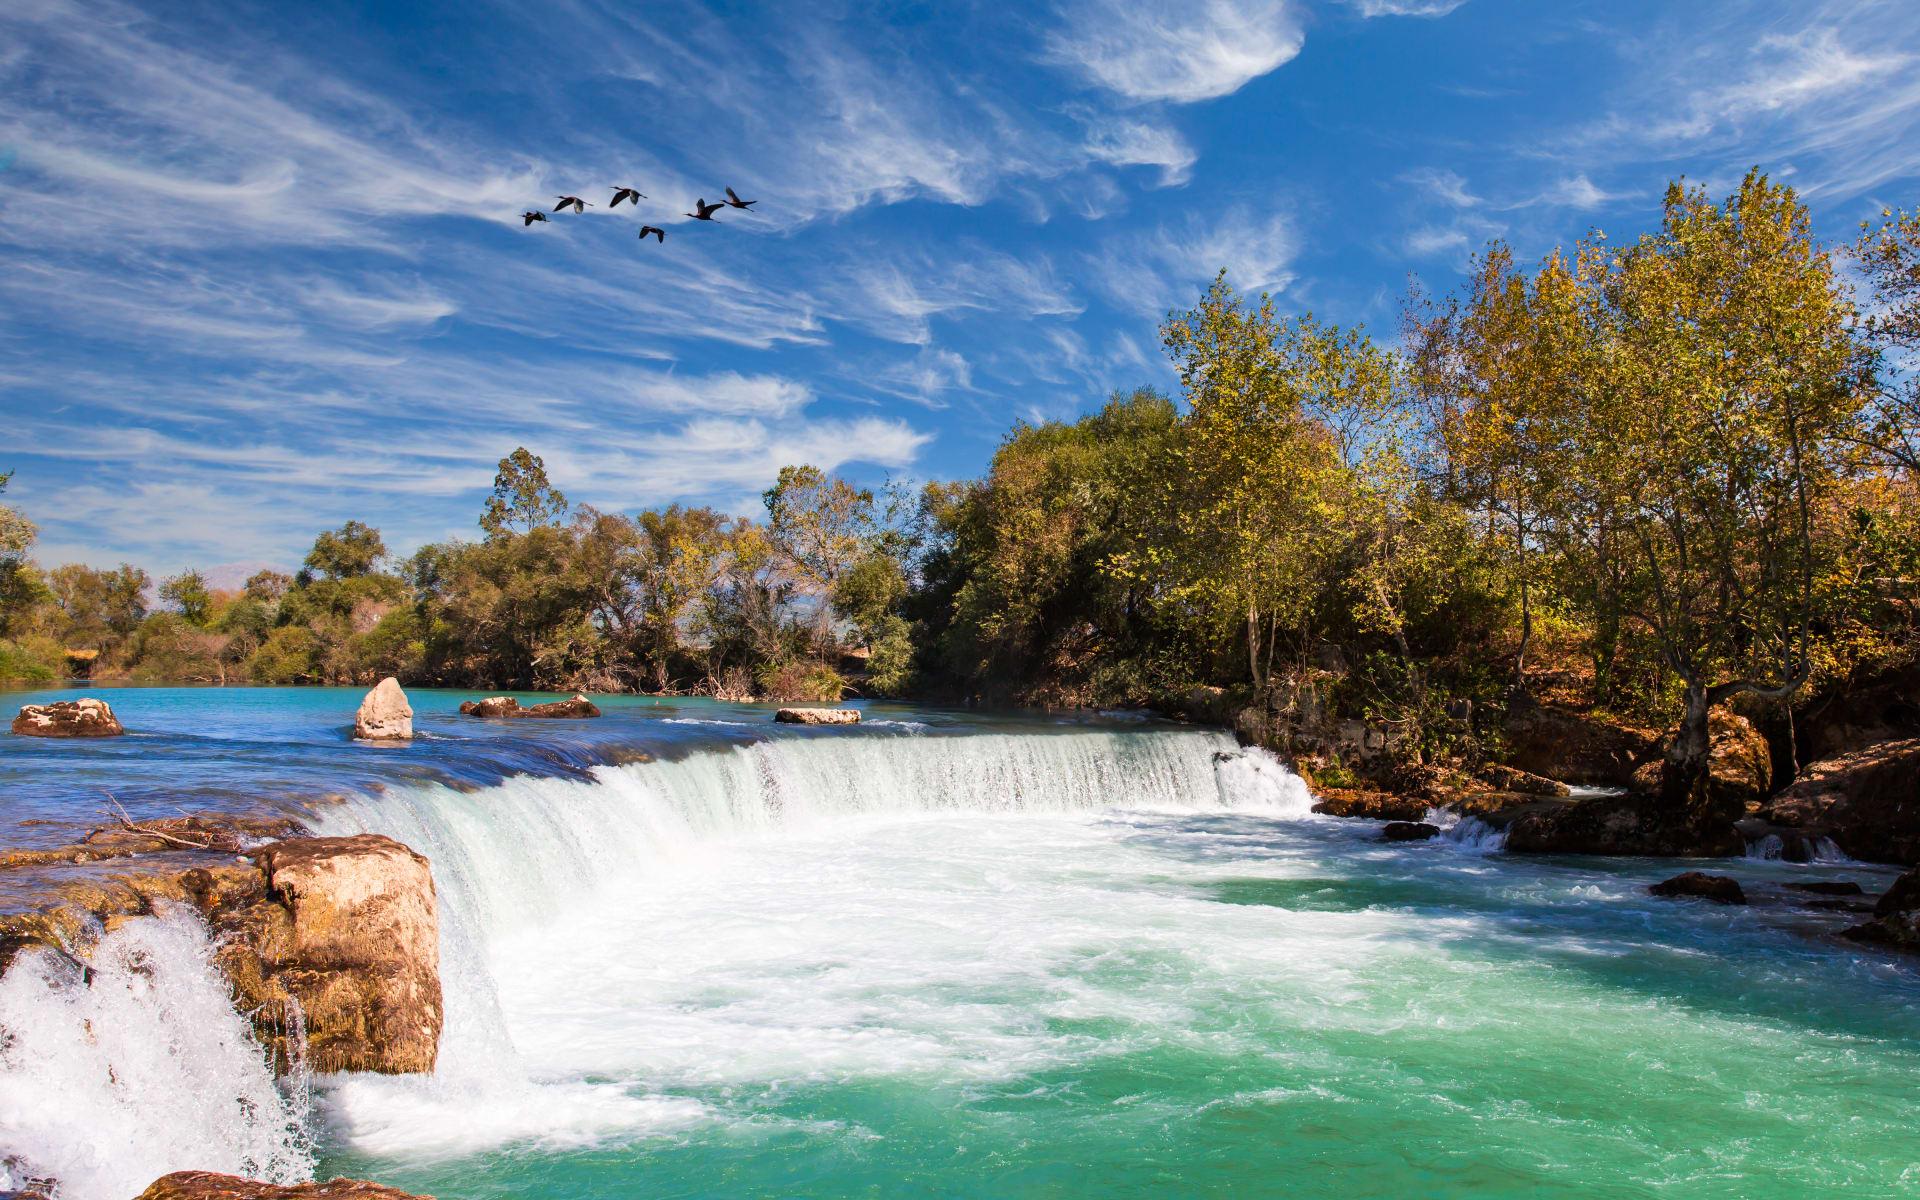 Badeferien im Barut Arum ab Antalya: Wasserfall Manavgat